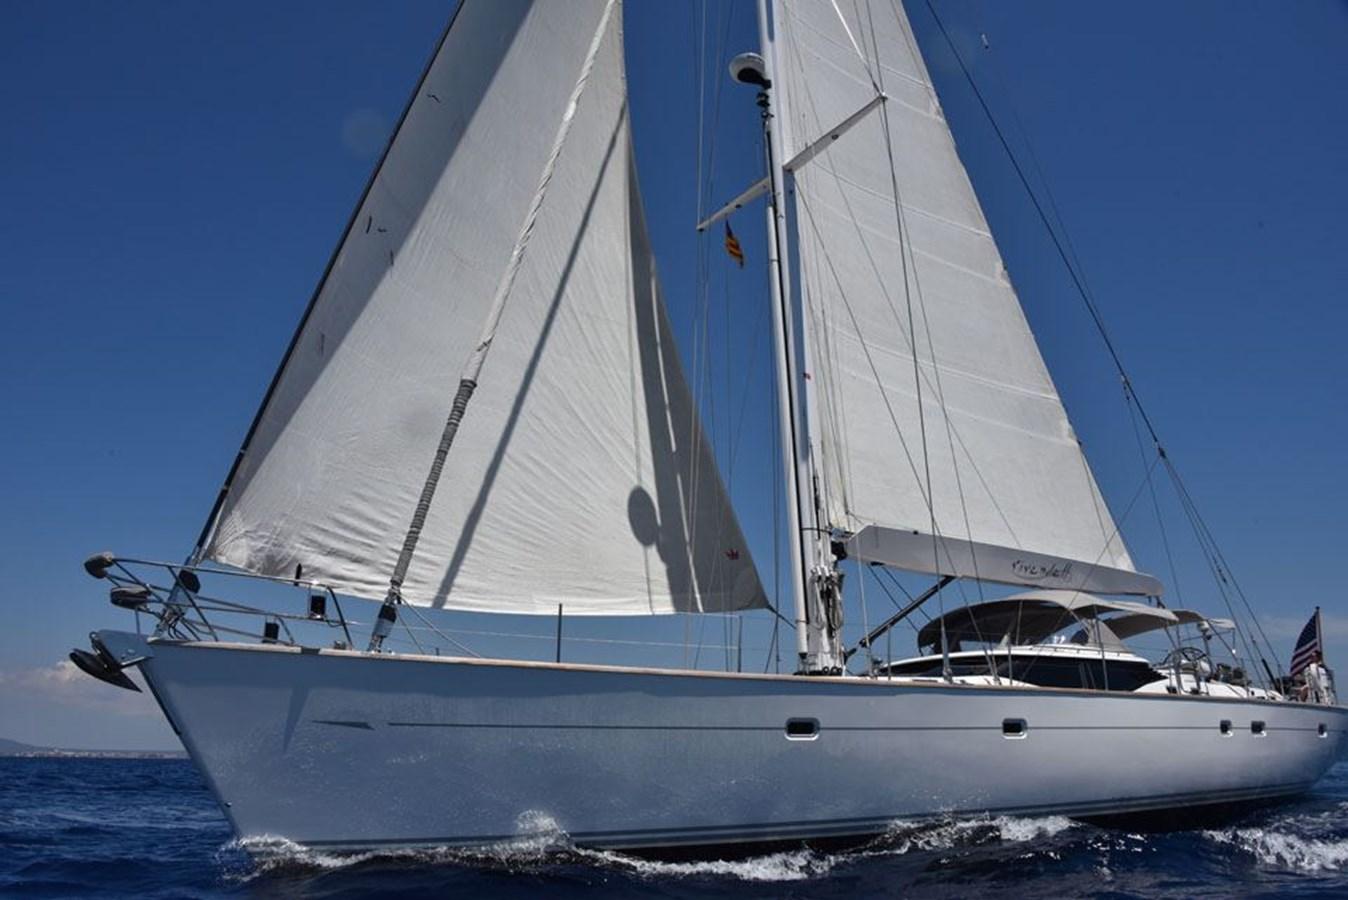 oyster-82-18 2009 OYSTER MARINE LTD Oyster 82 Cruising Sailboat 2806228